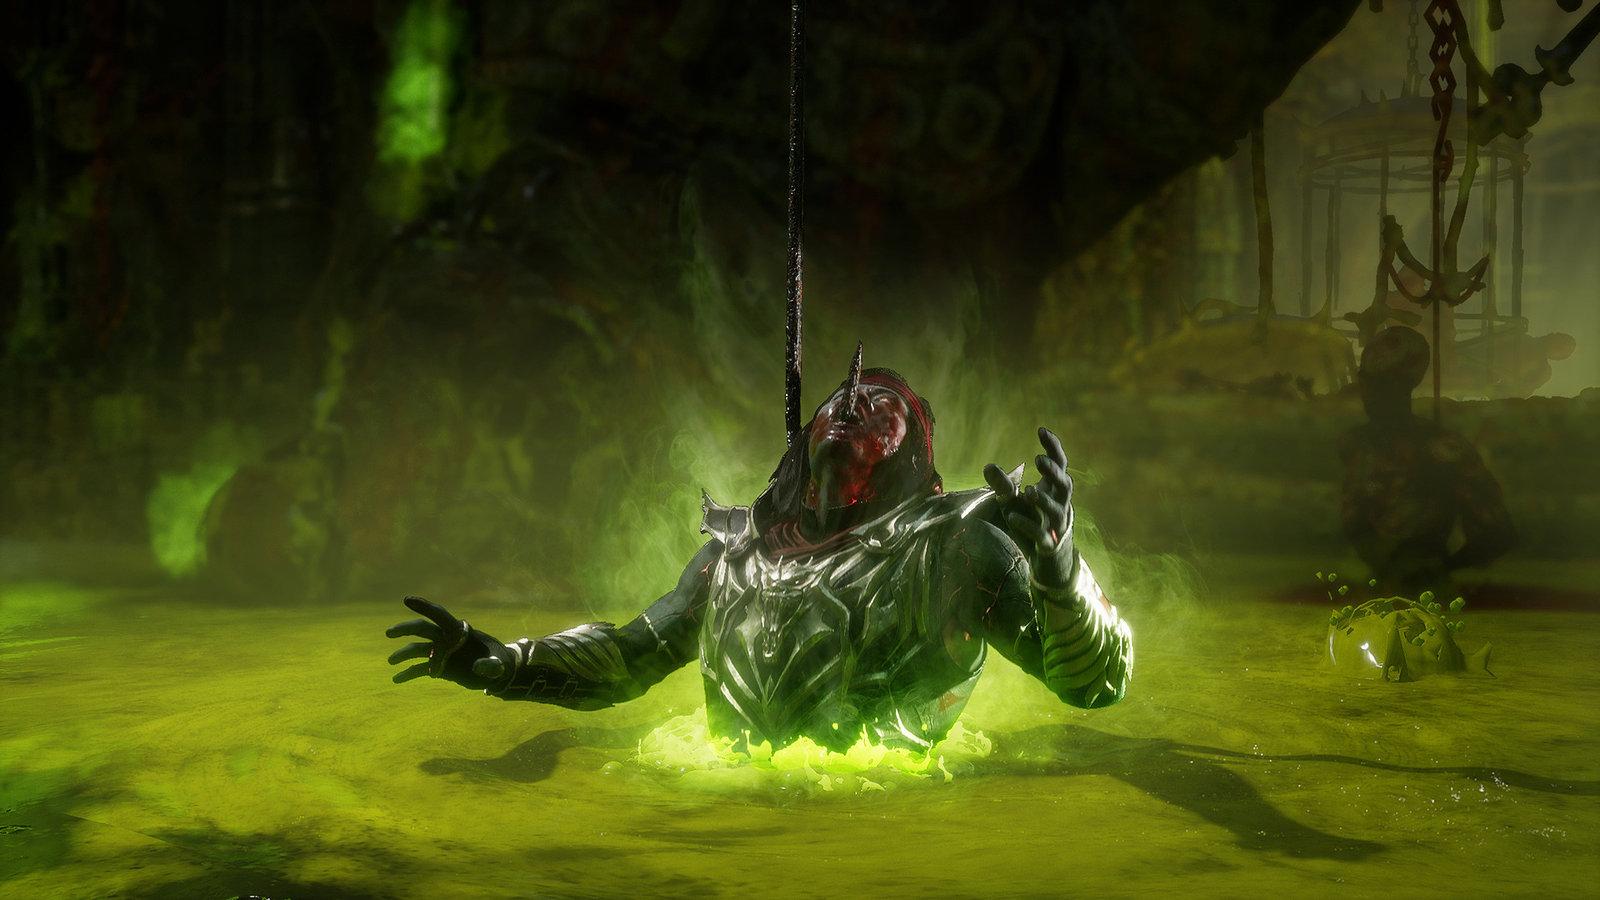 Mortal Kombat 11 Ultimate Edition image 3